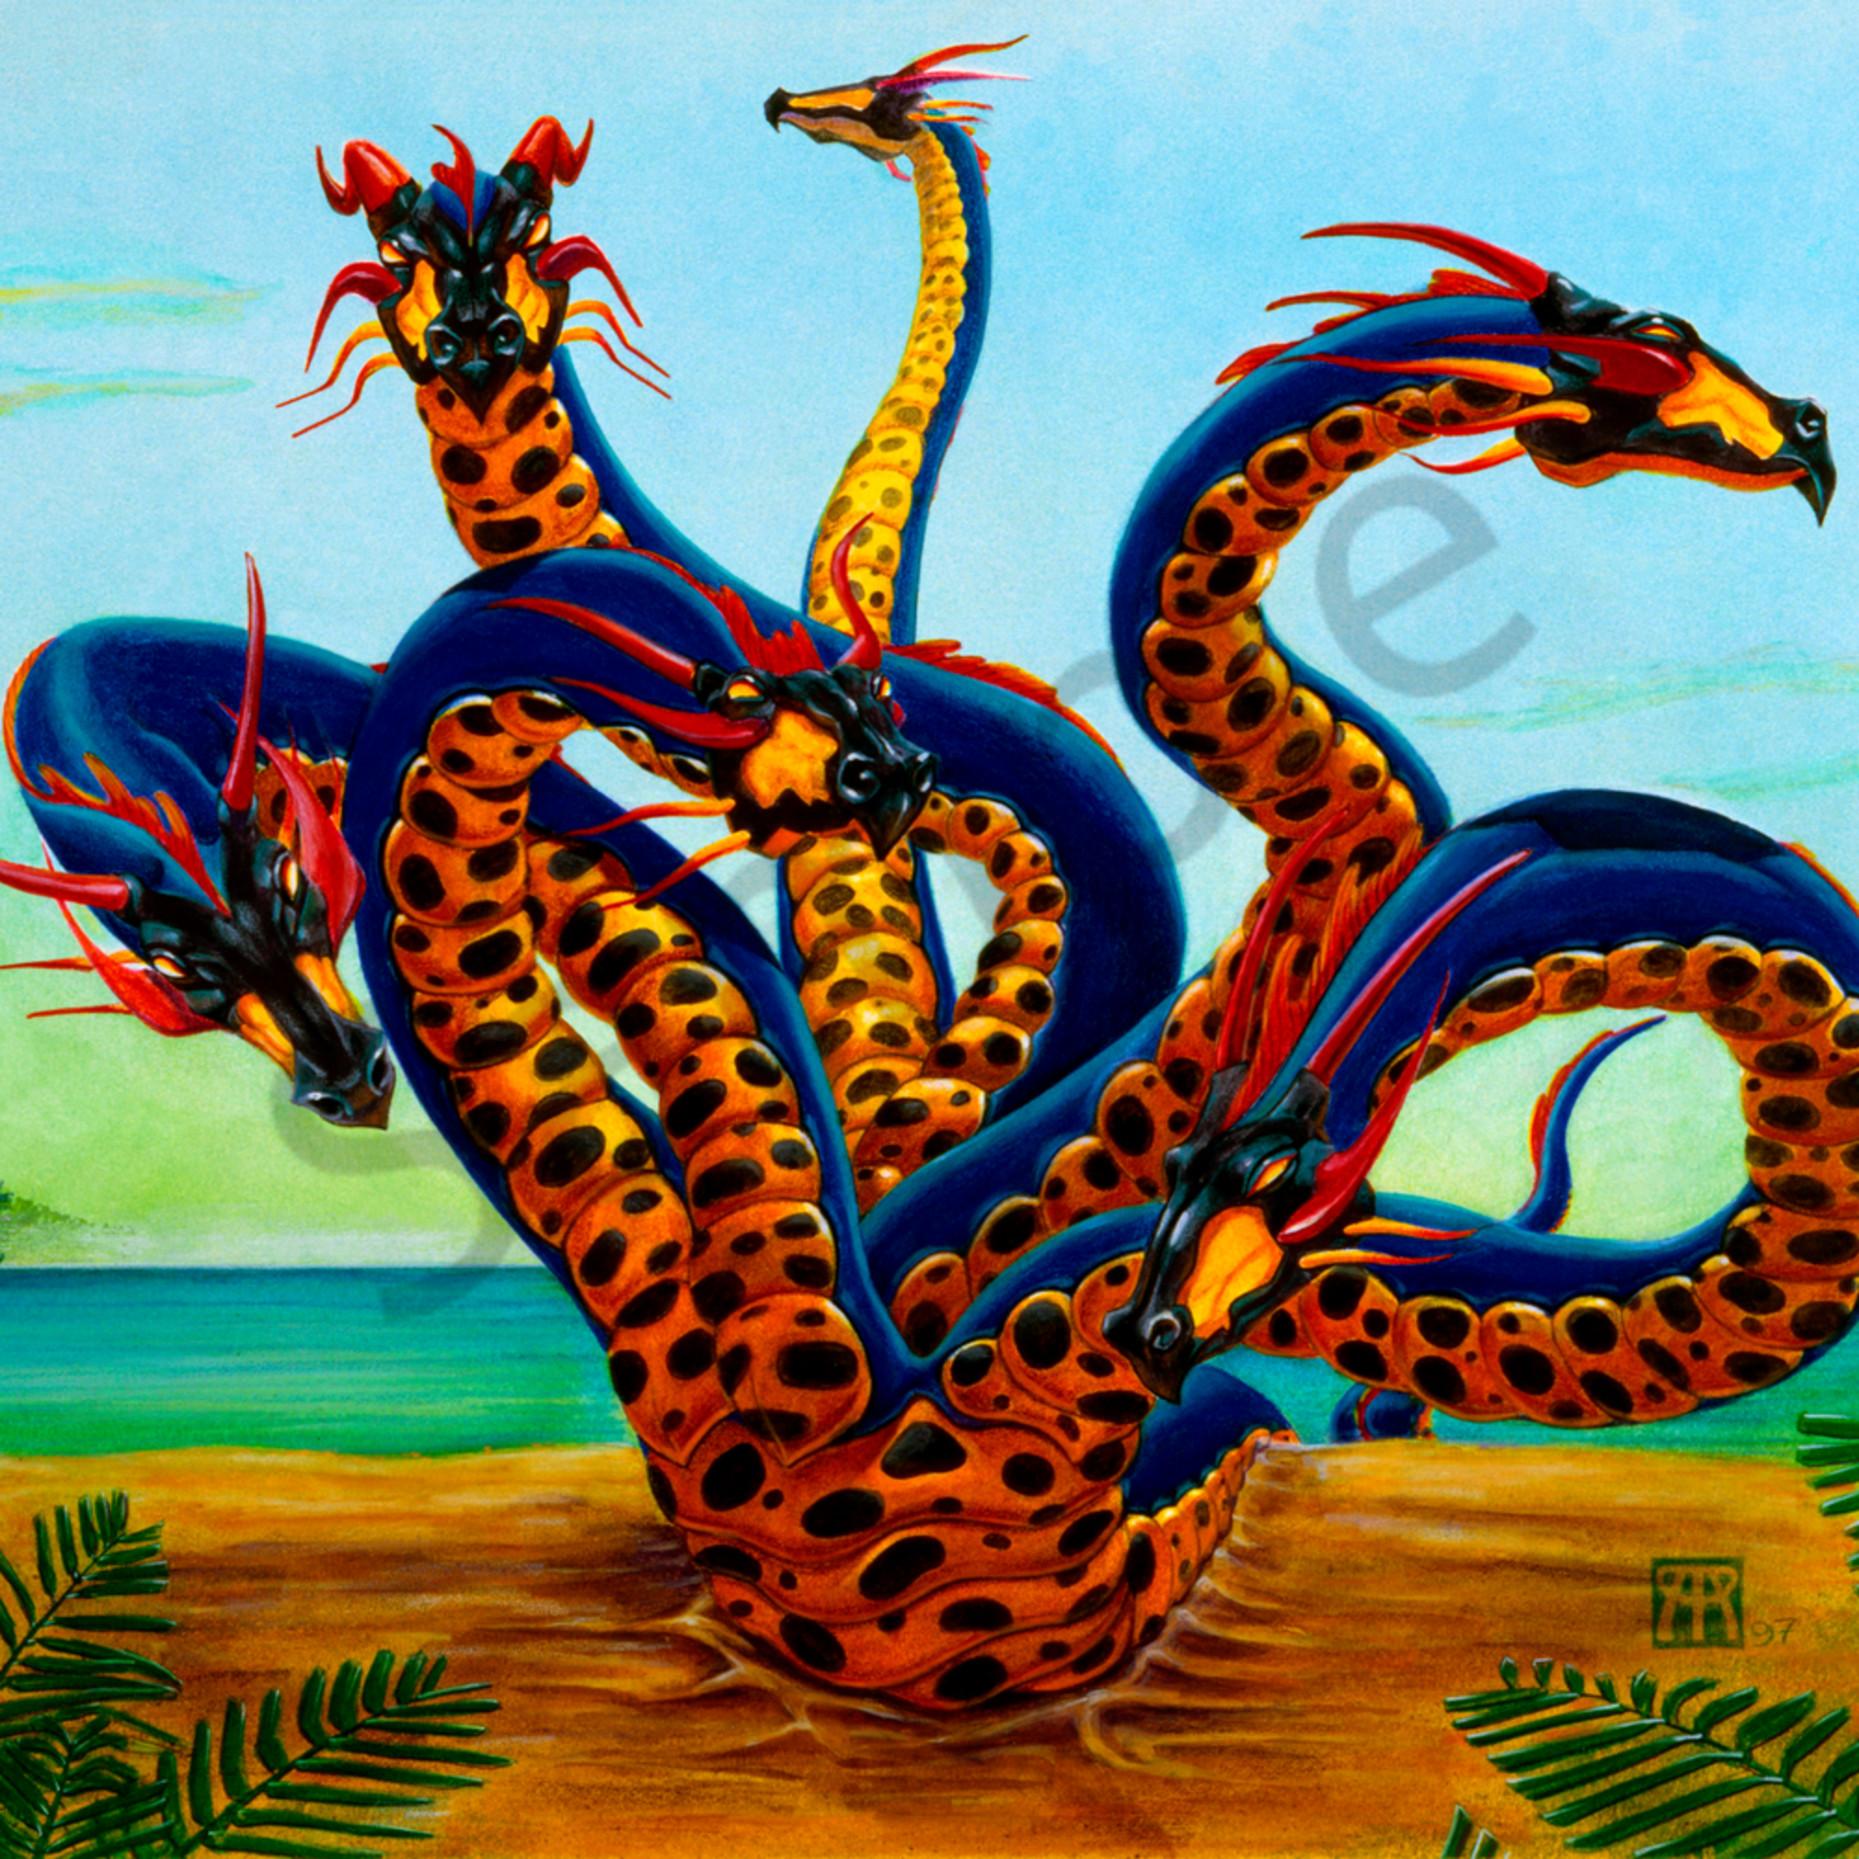 Hydra on beach q8p8zh